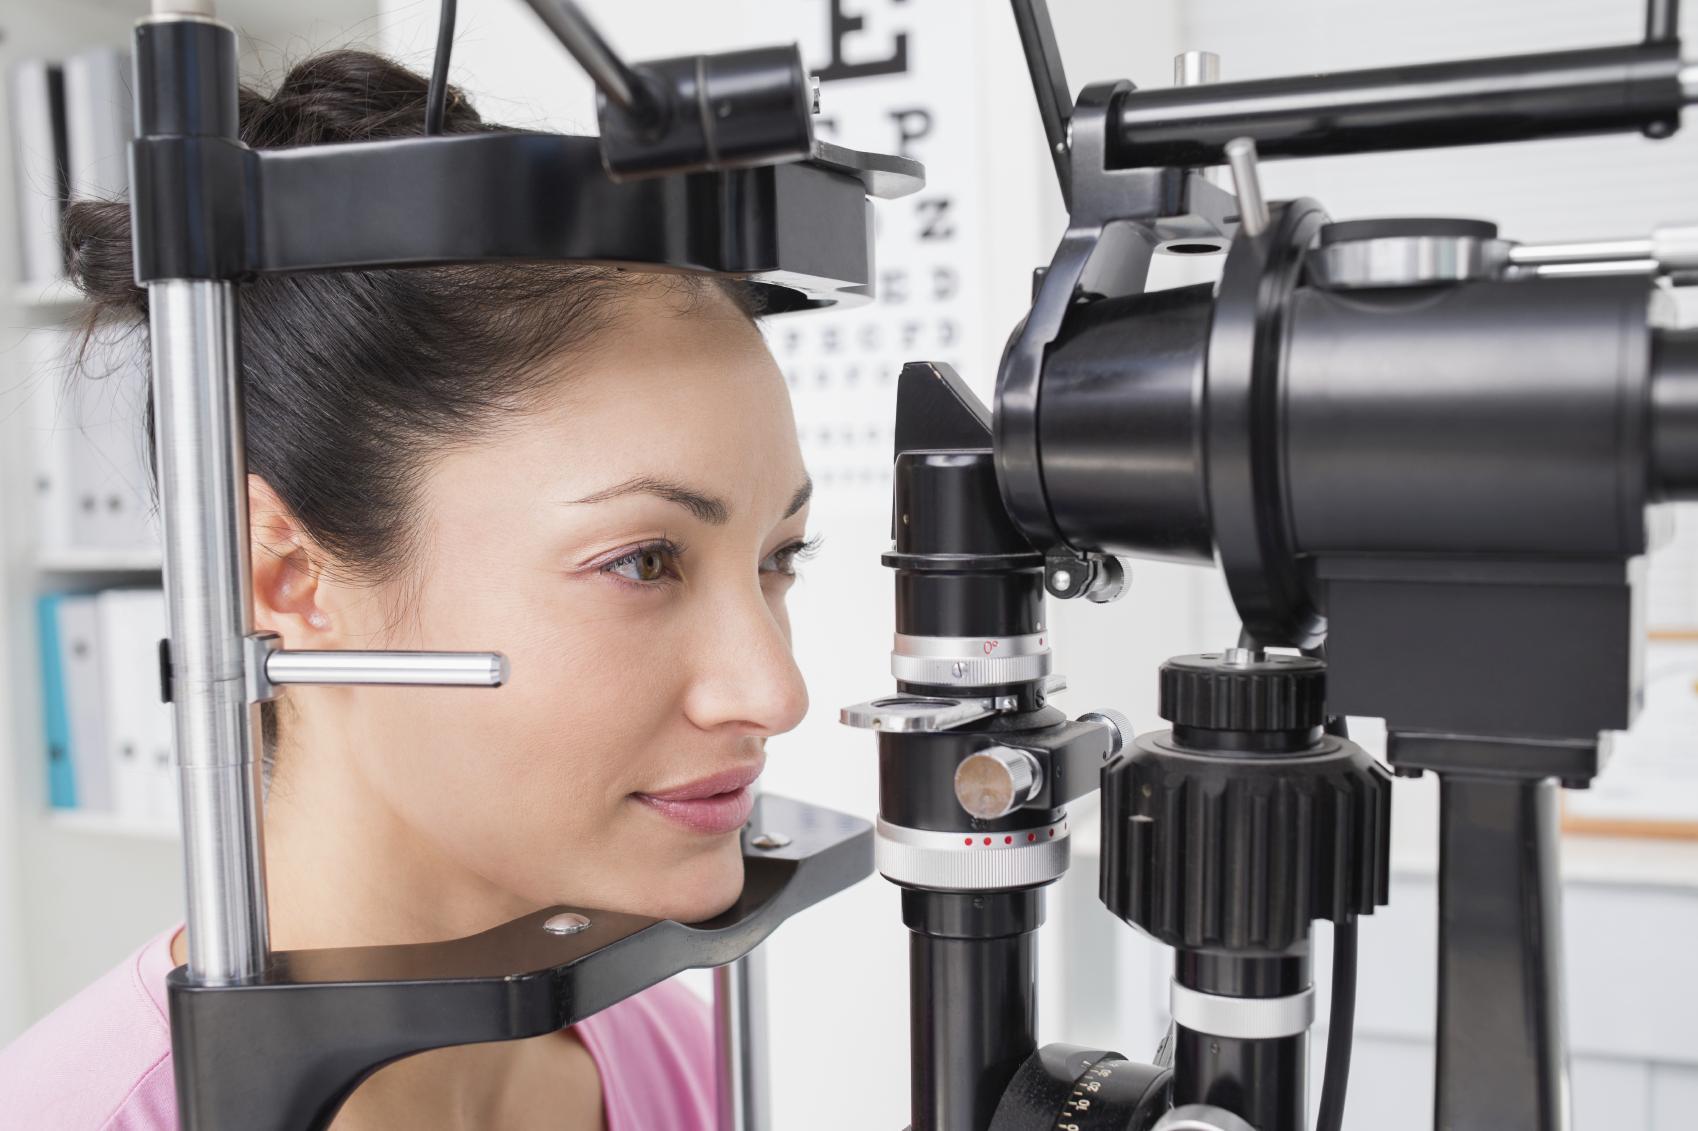 Mujer morena durante prueba oftalmológica